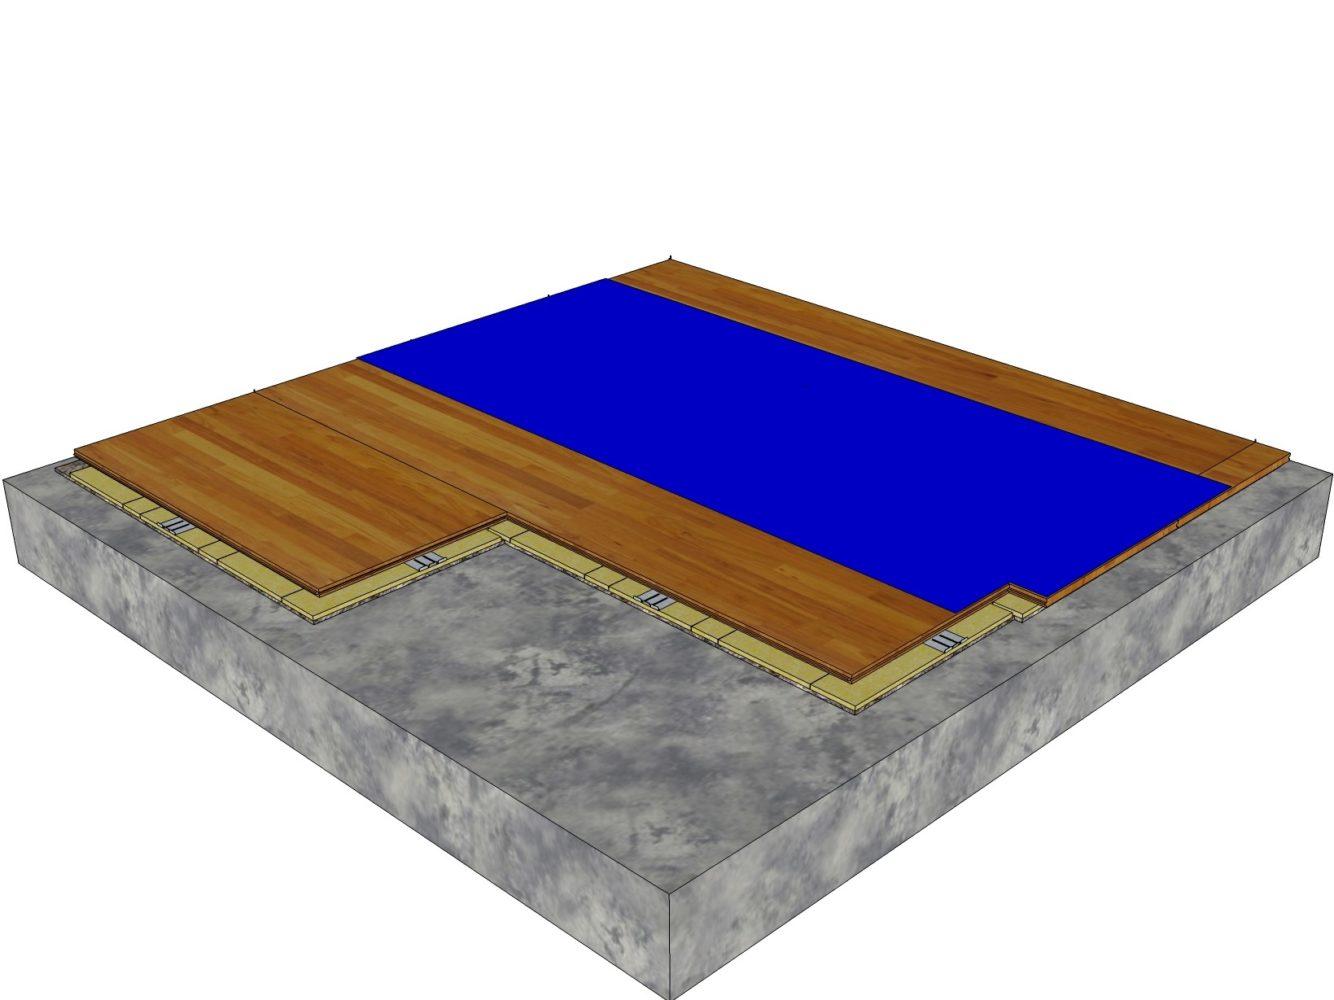 Mobile sports flooring